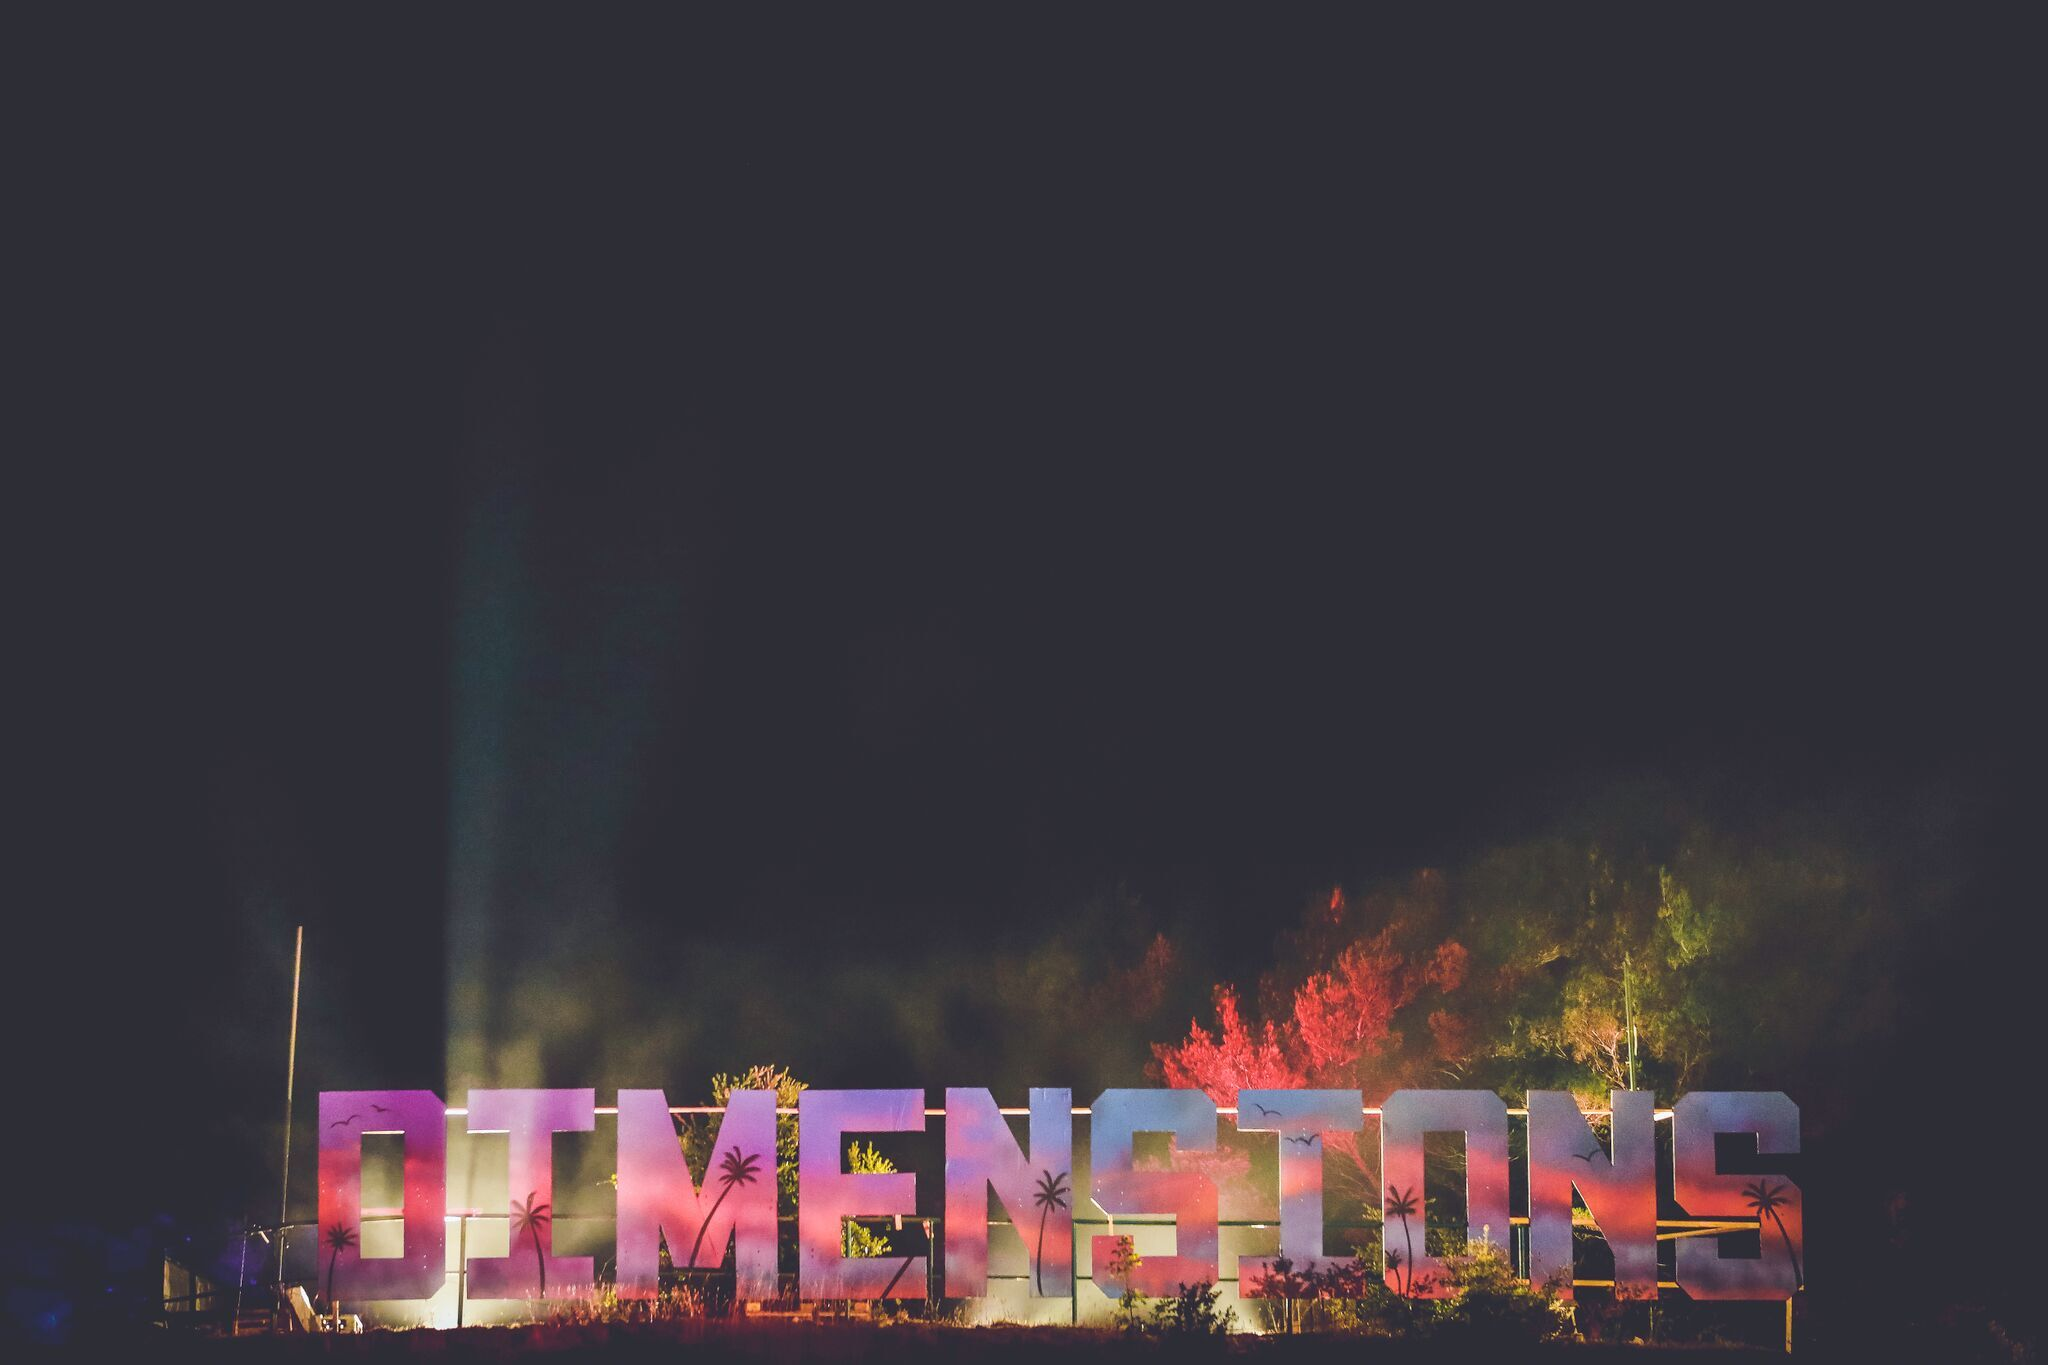 https://www.dimensionsfestival.com/